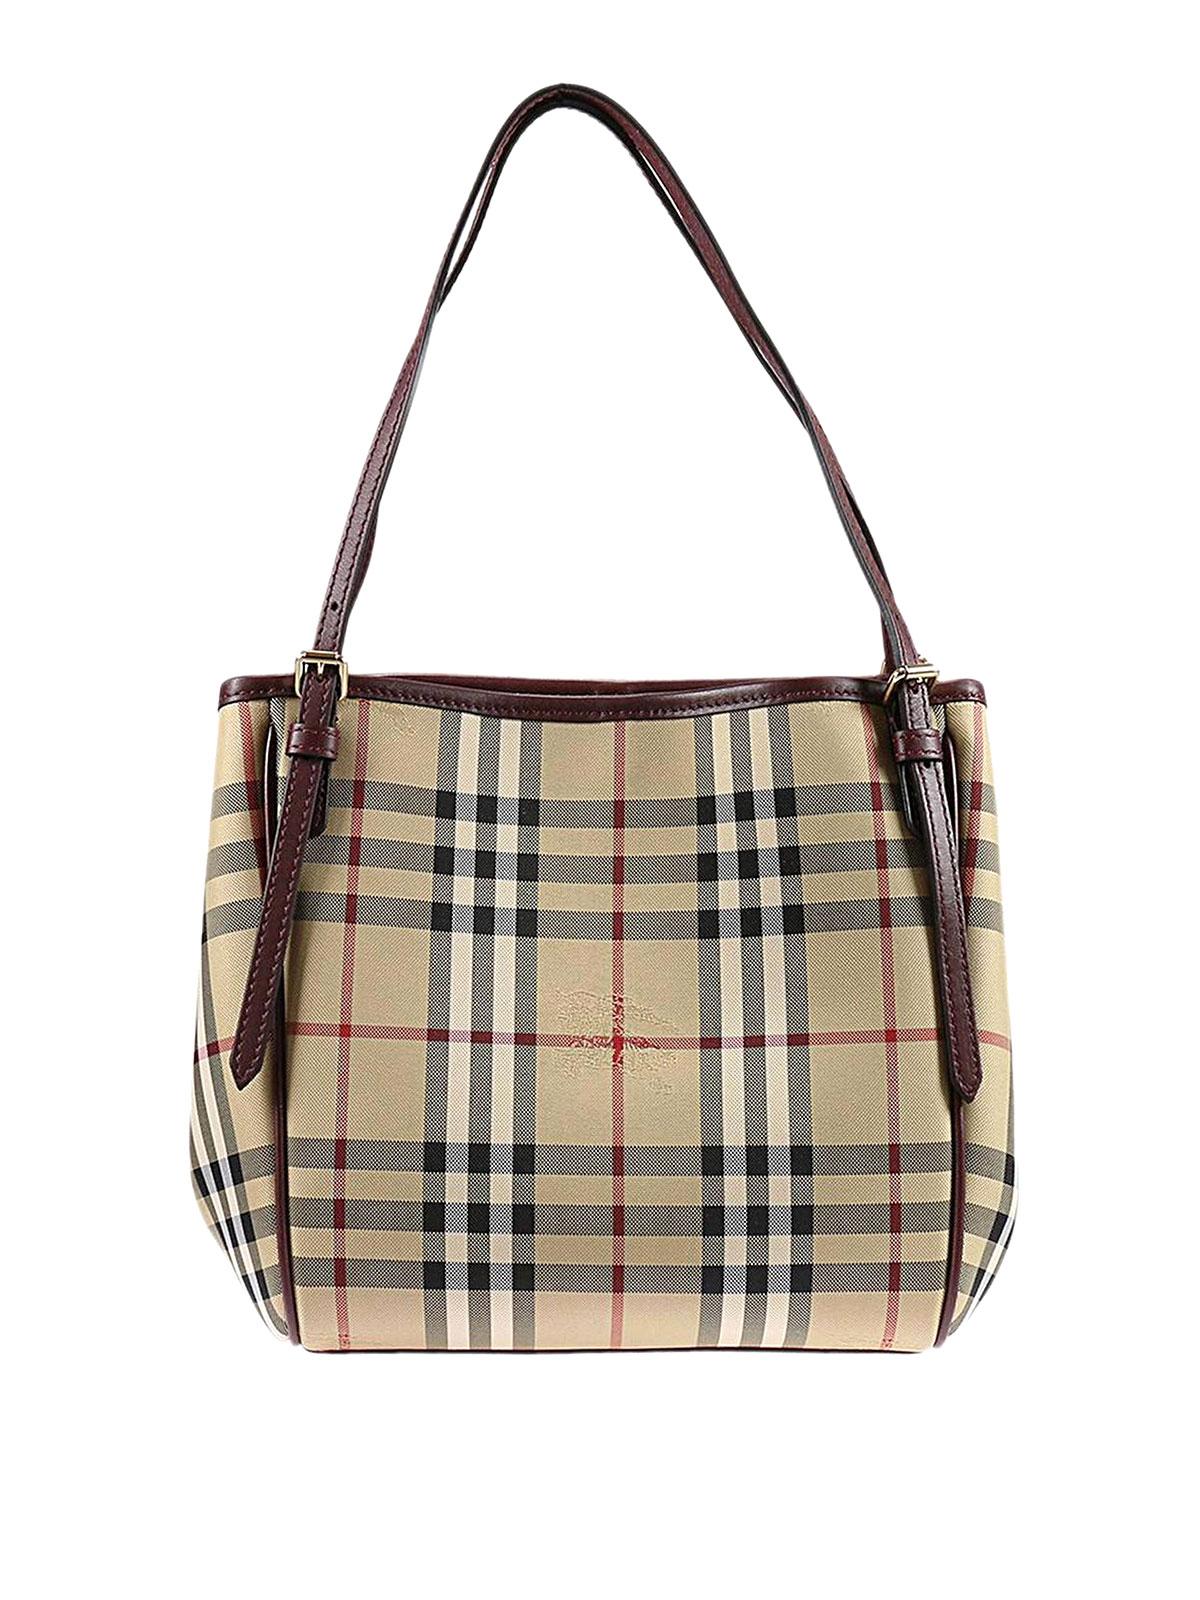 2ad1e006c50b Burberry - Mini Canter Horseferry check tote - totes bags - 40223711